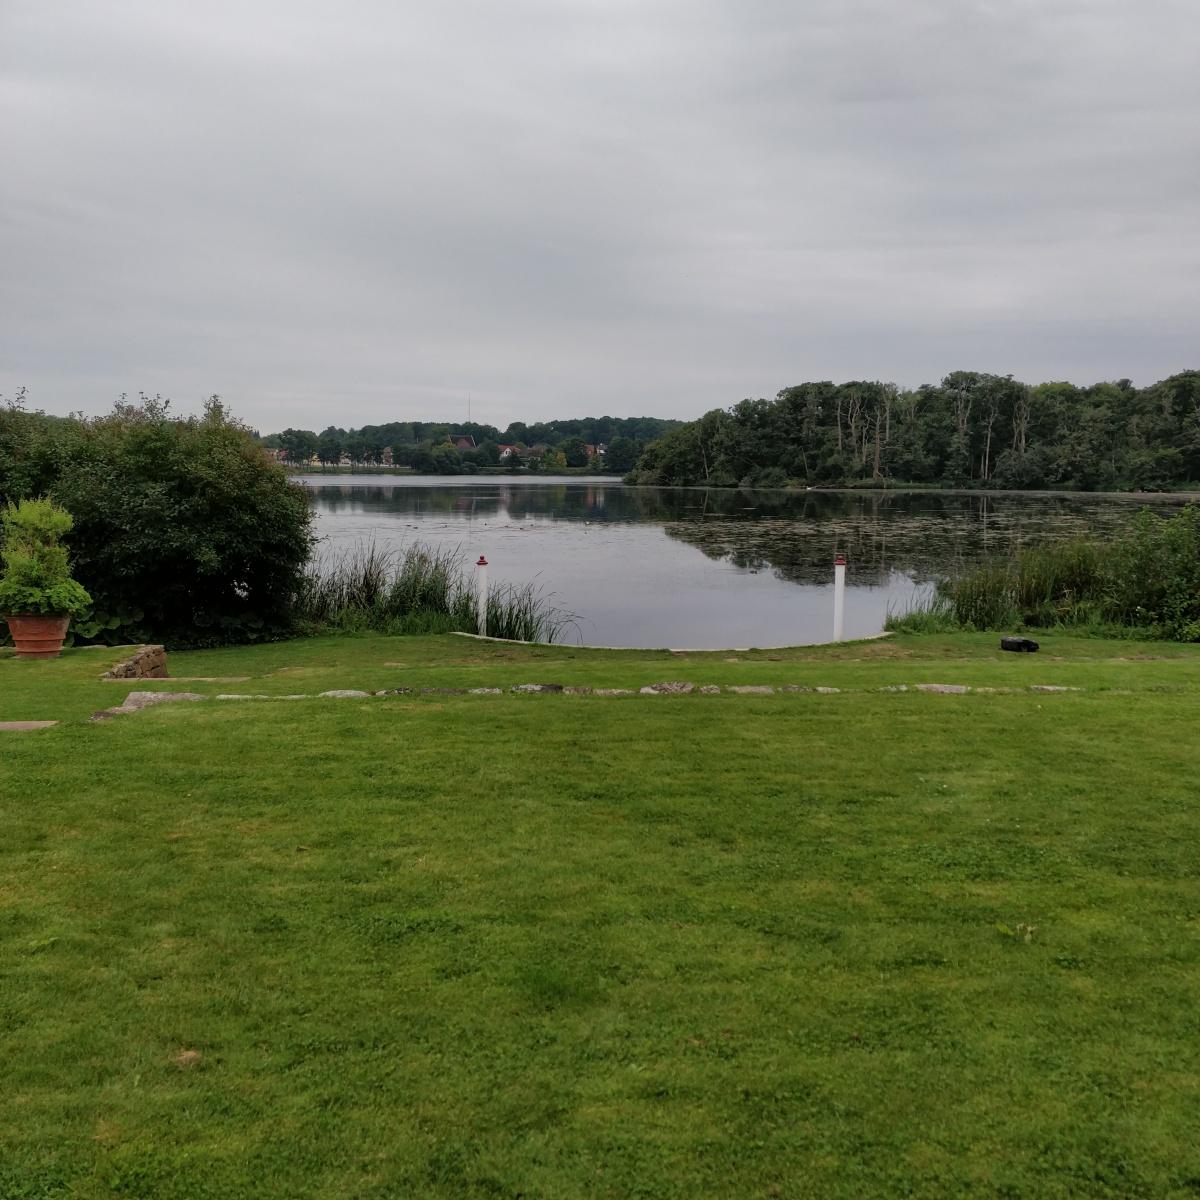 Denemarken in 8 indrukken na 1 dag